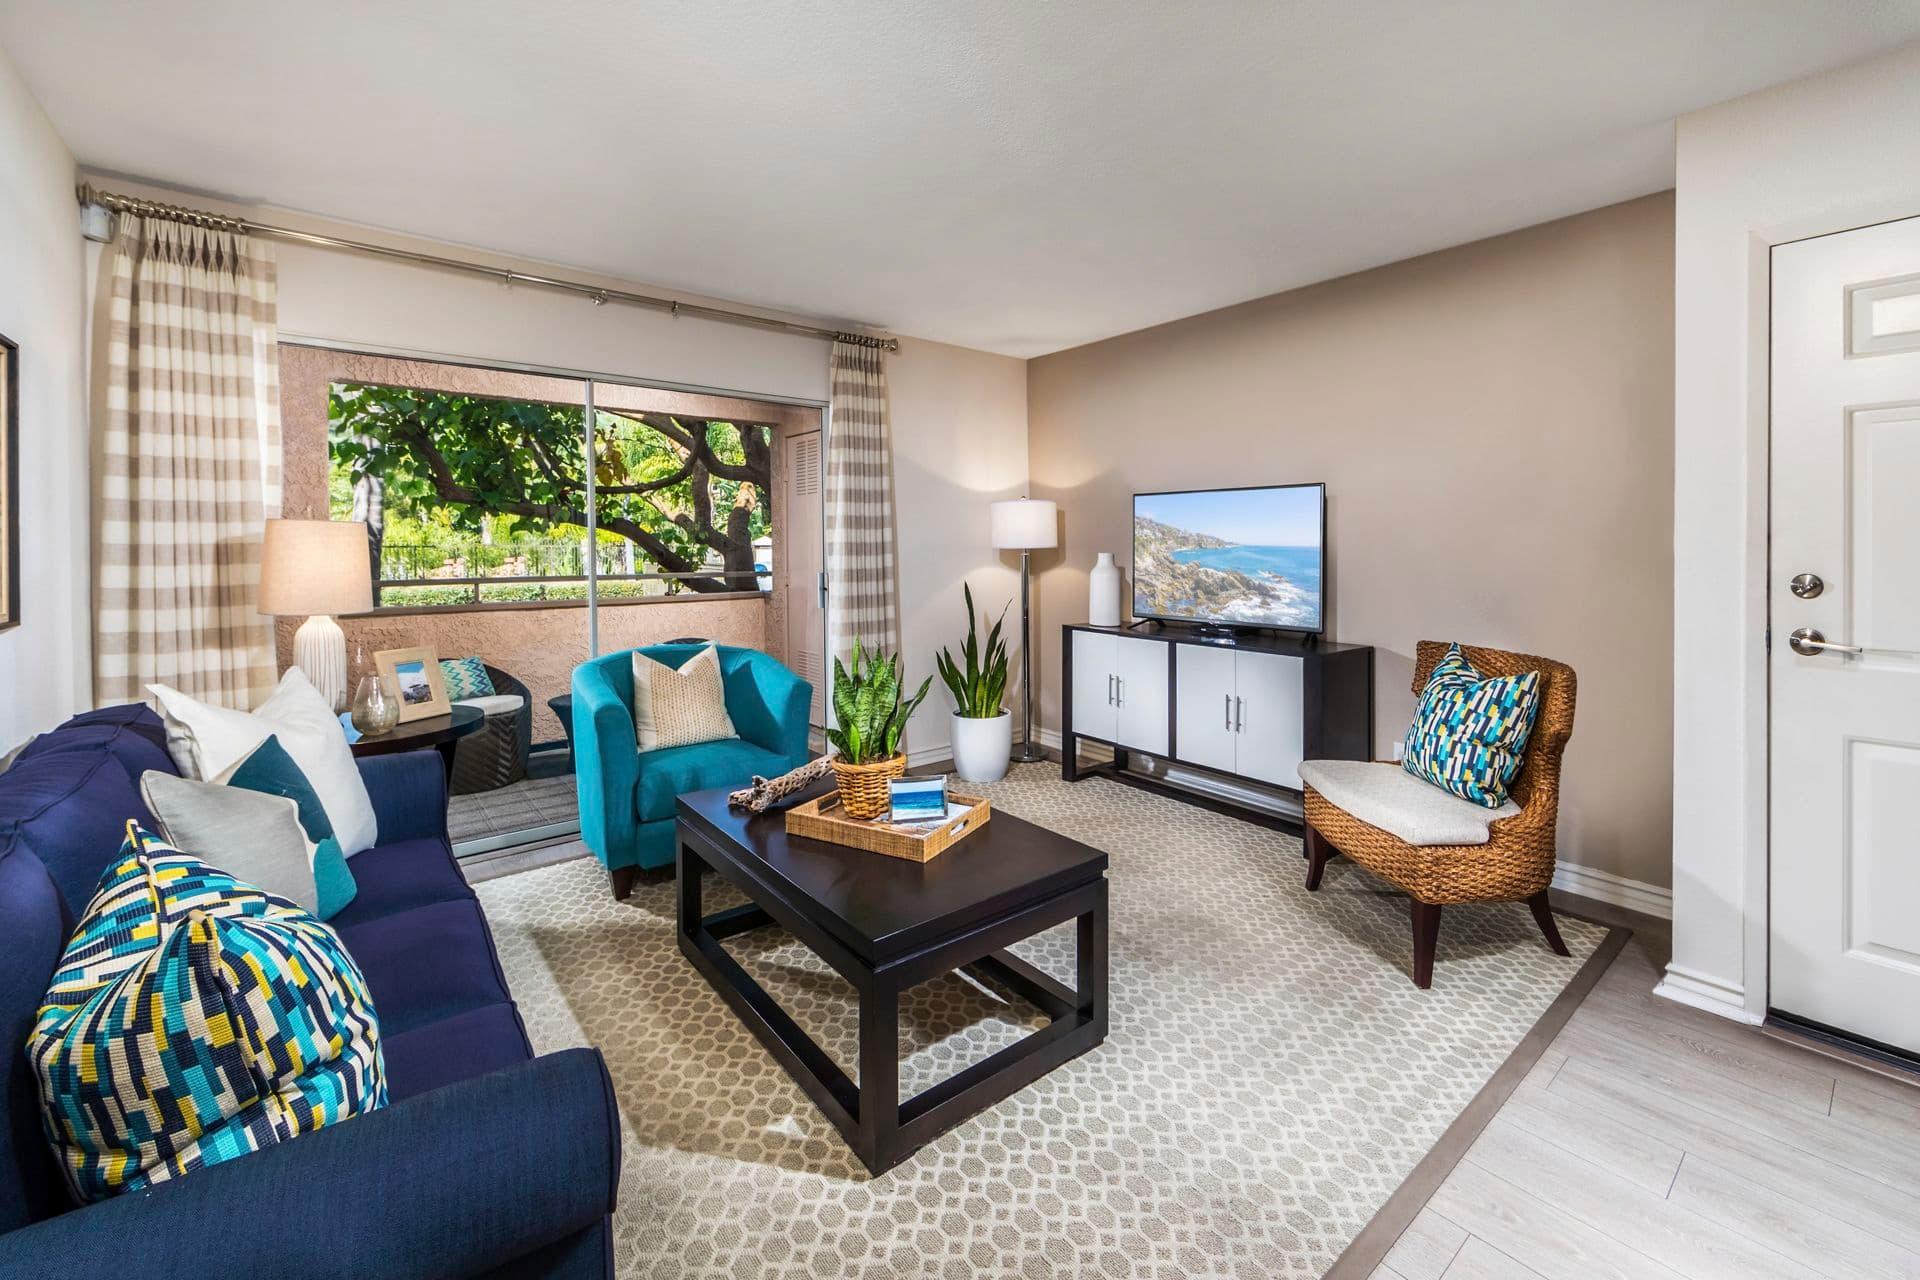 Interior view of living room at Solazzo Apartment Homes in La Jolla, CA.